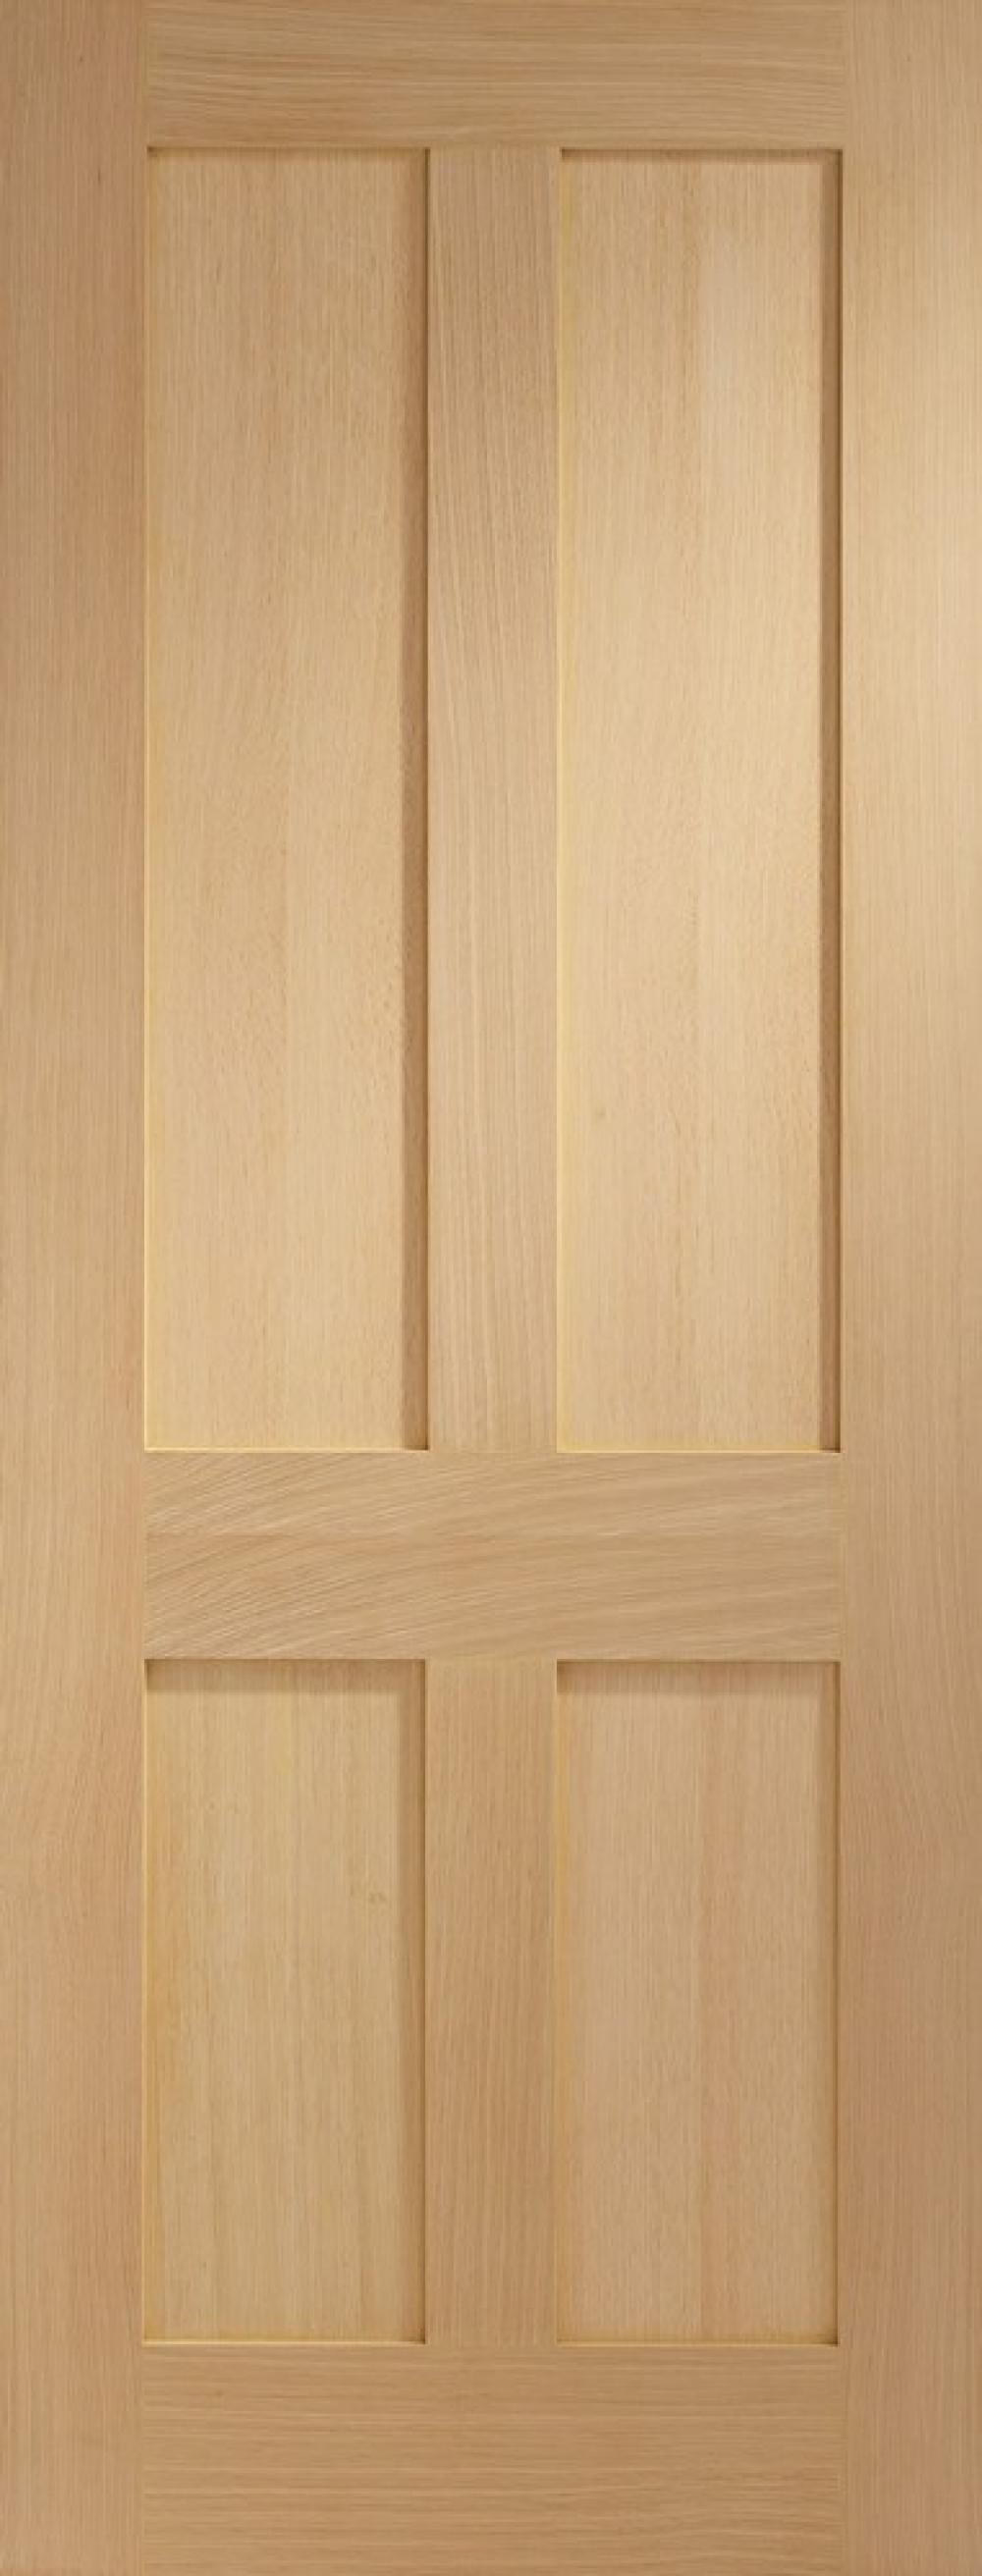 Oak Victorian 4 Panel Shaker Image